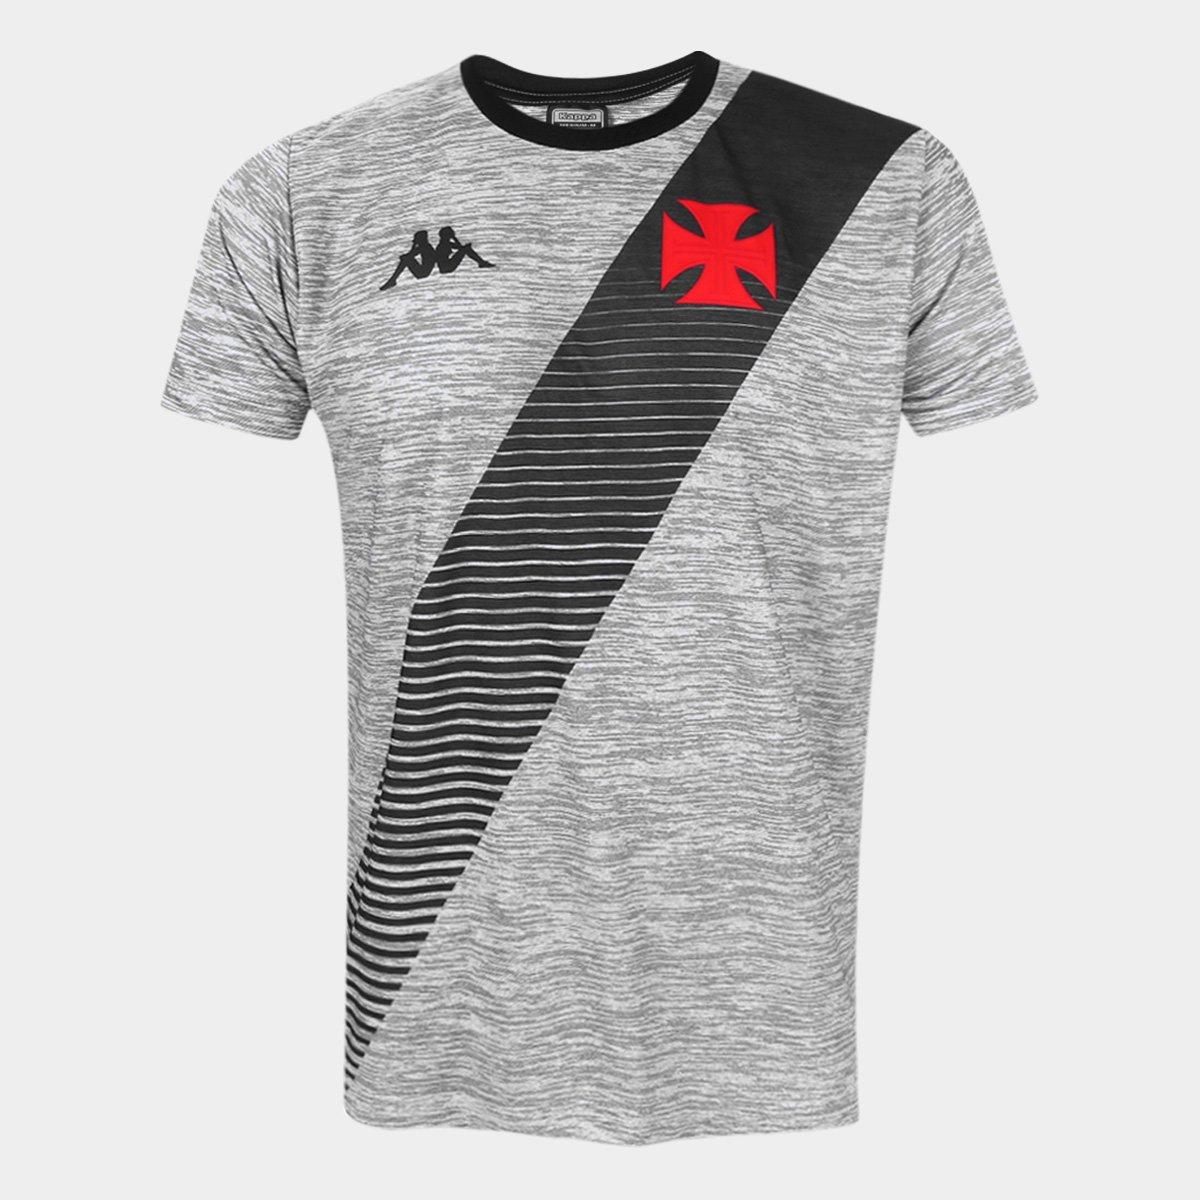 Camiseta Vasco Supporter Mixed Masculina - Mescla Claro